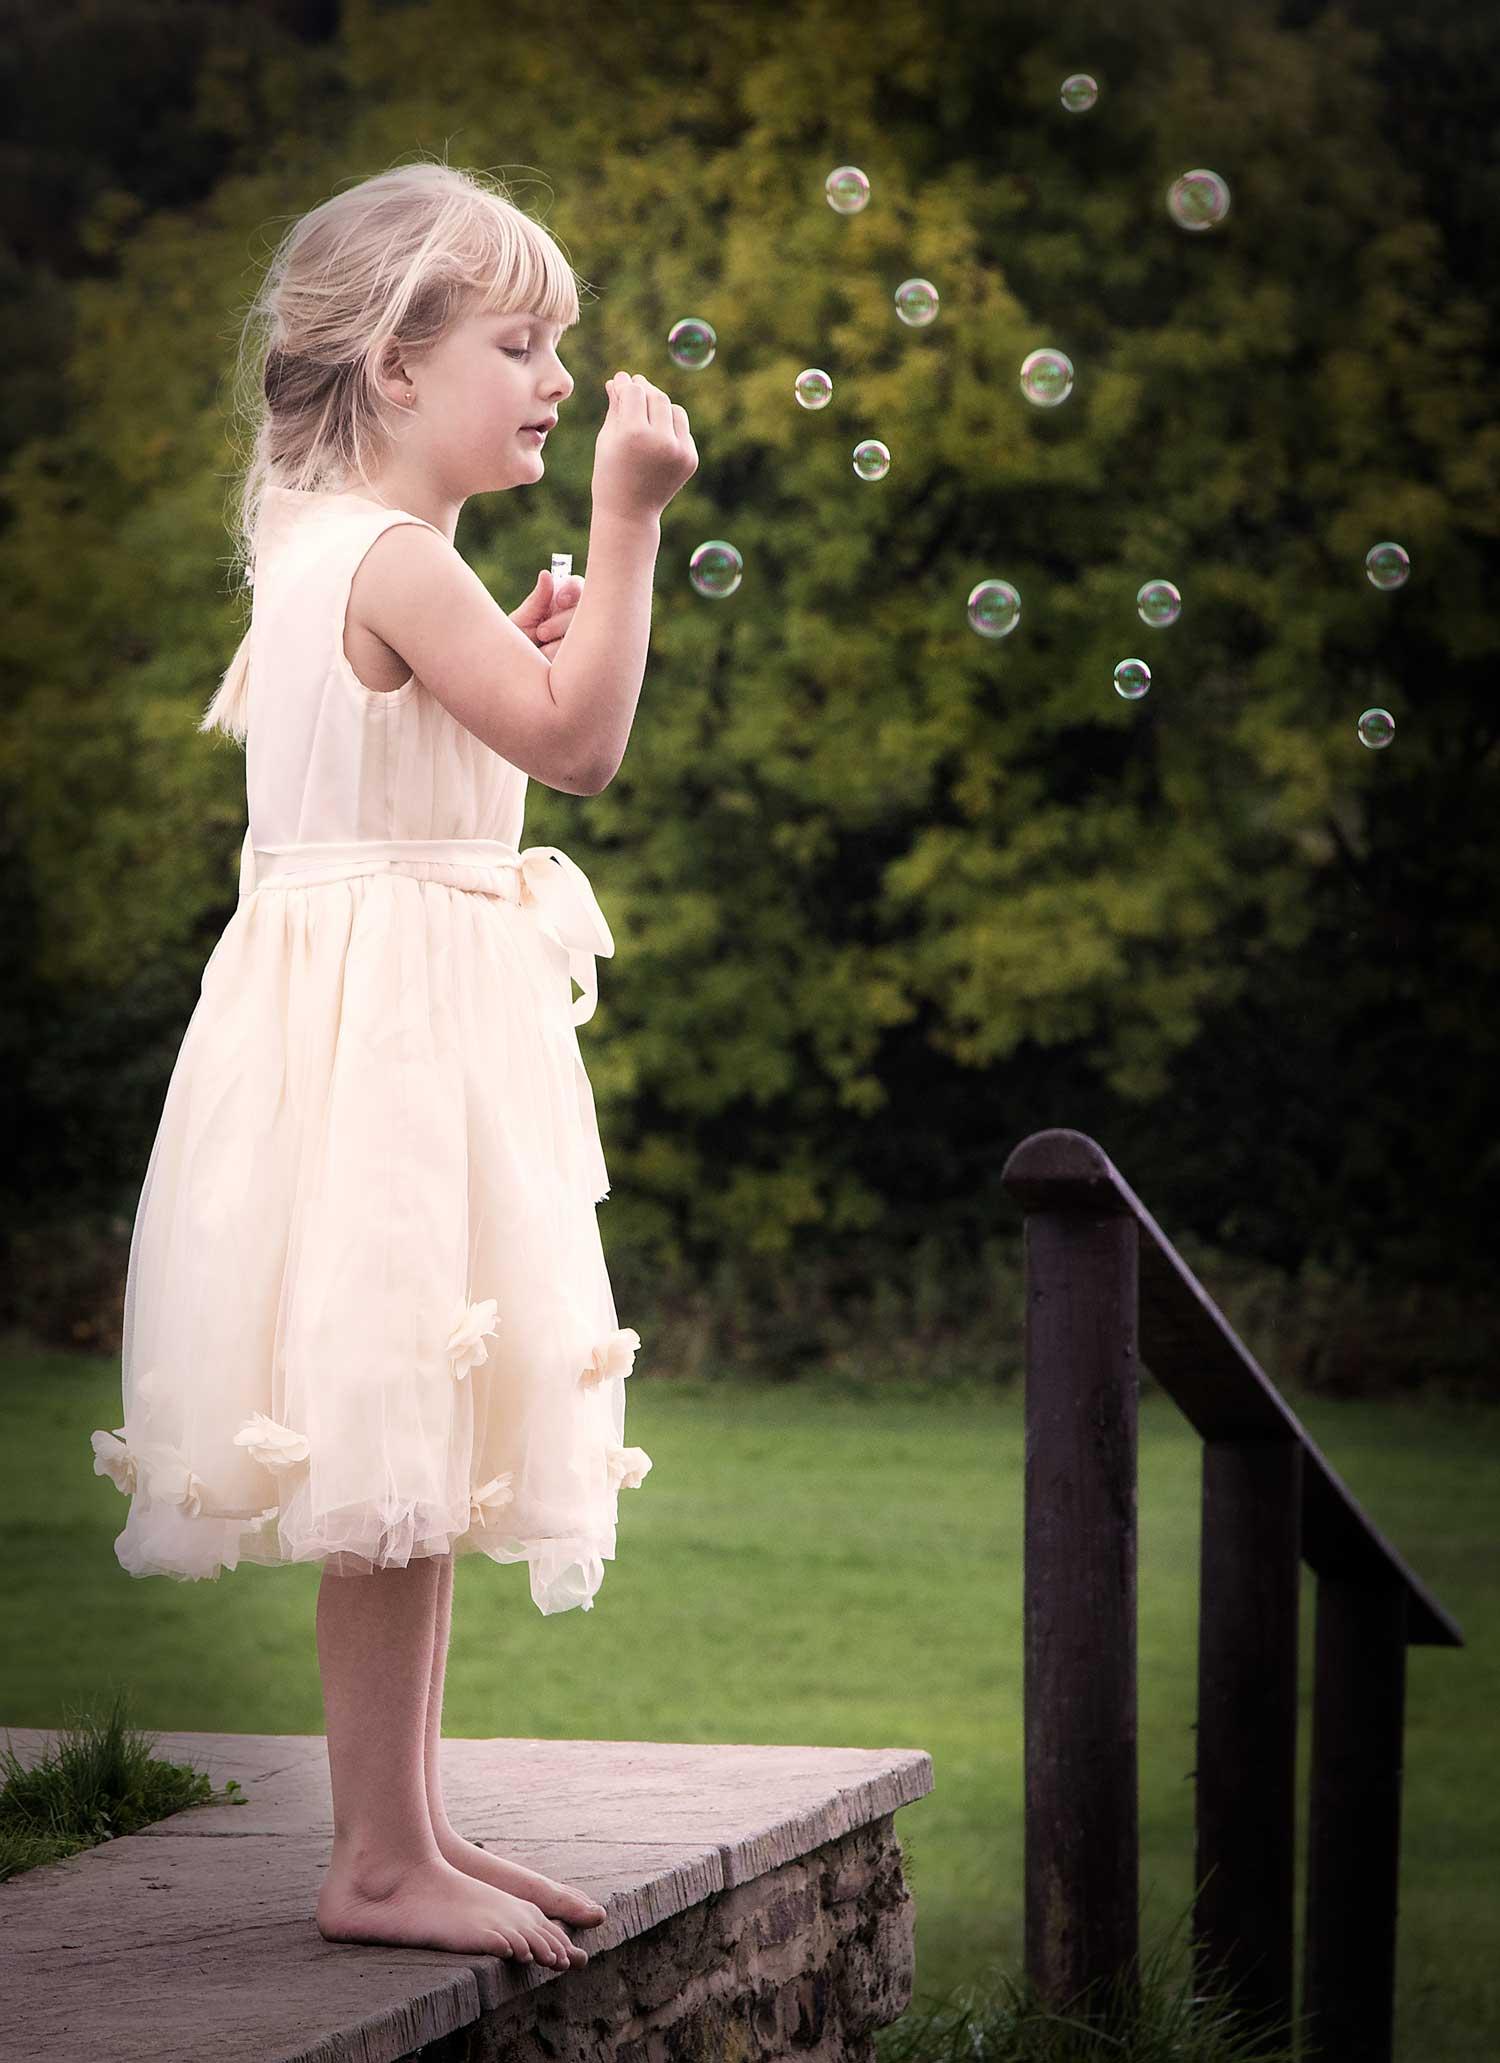 girl-bubbles.jpg